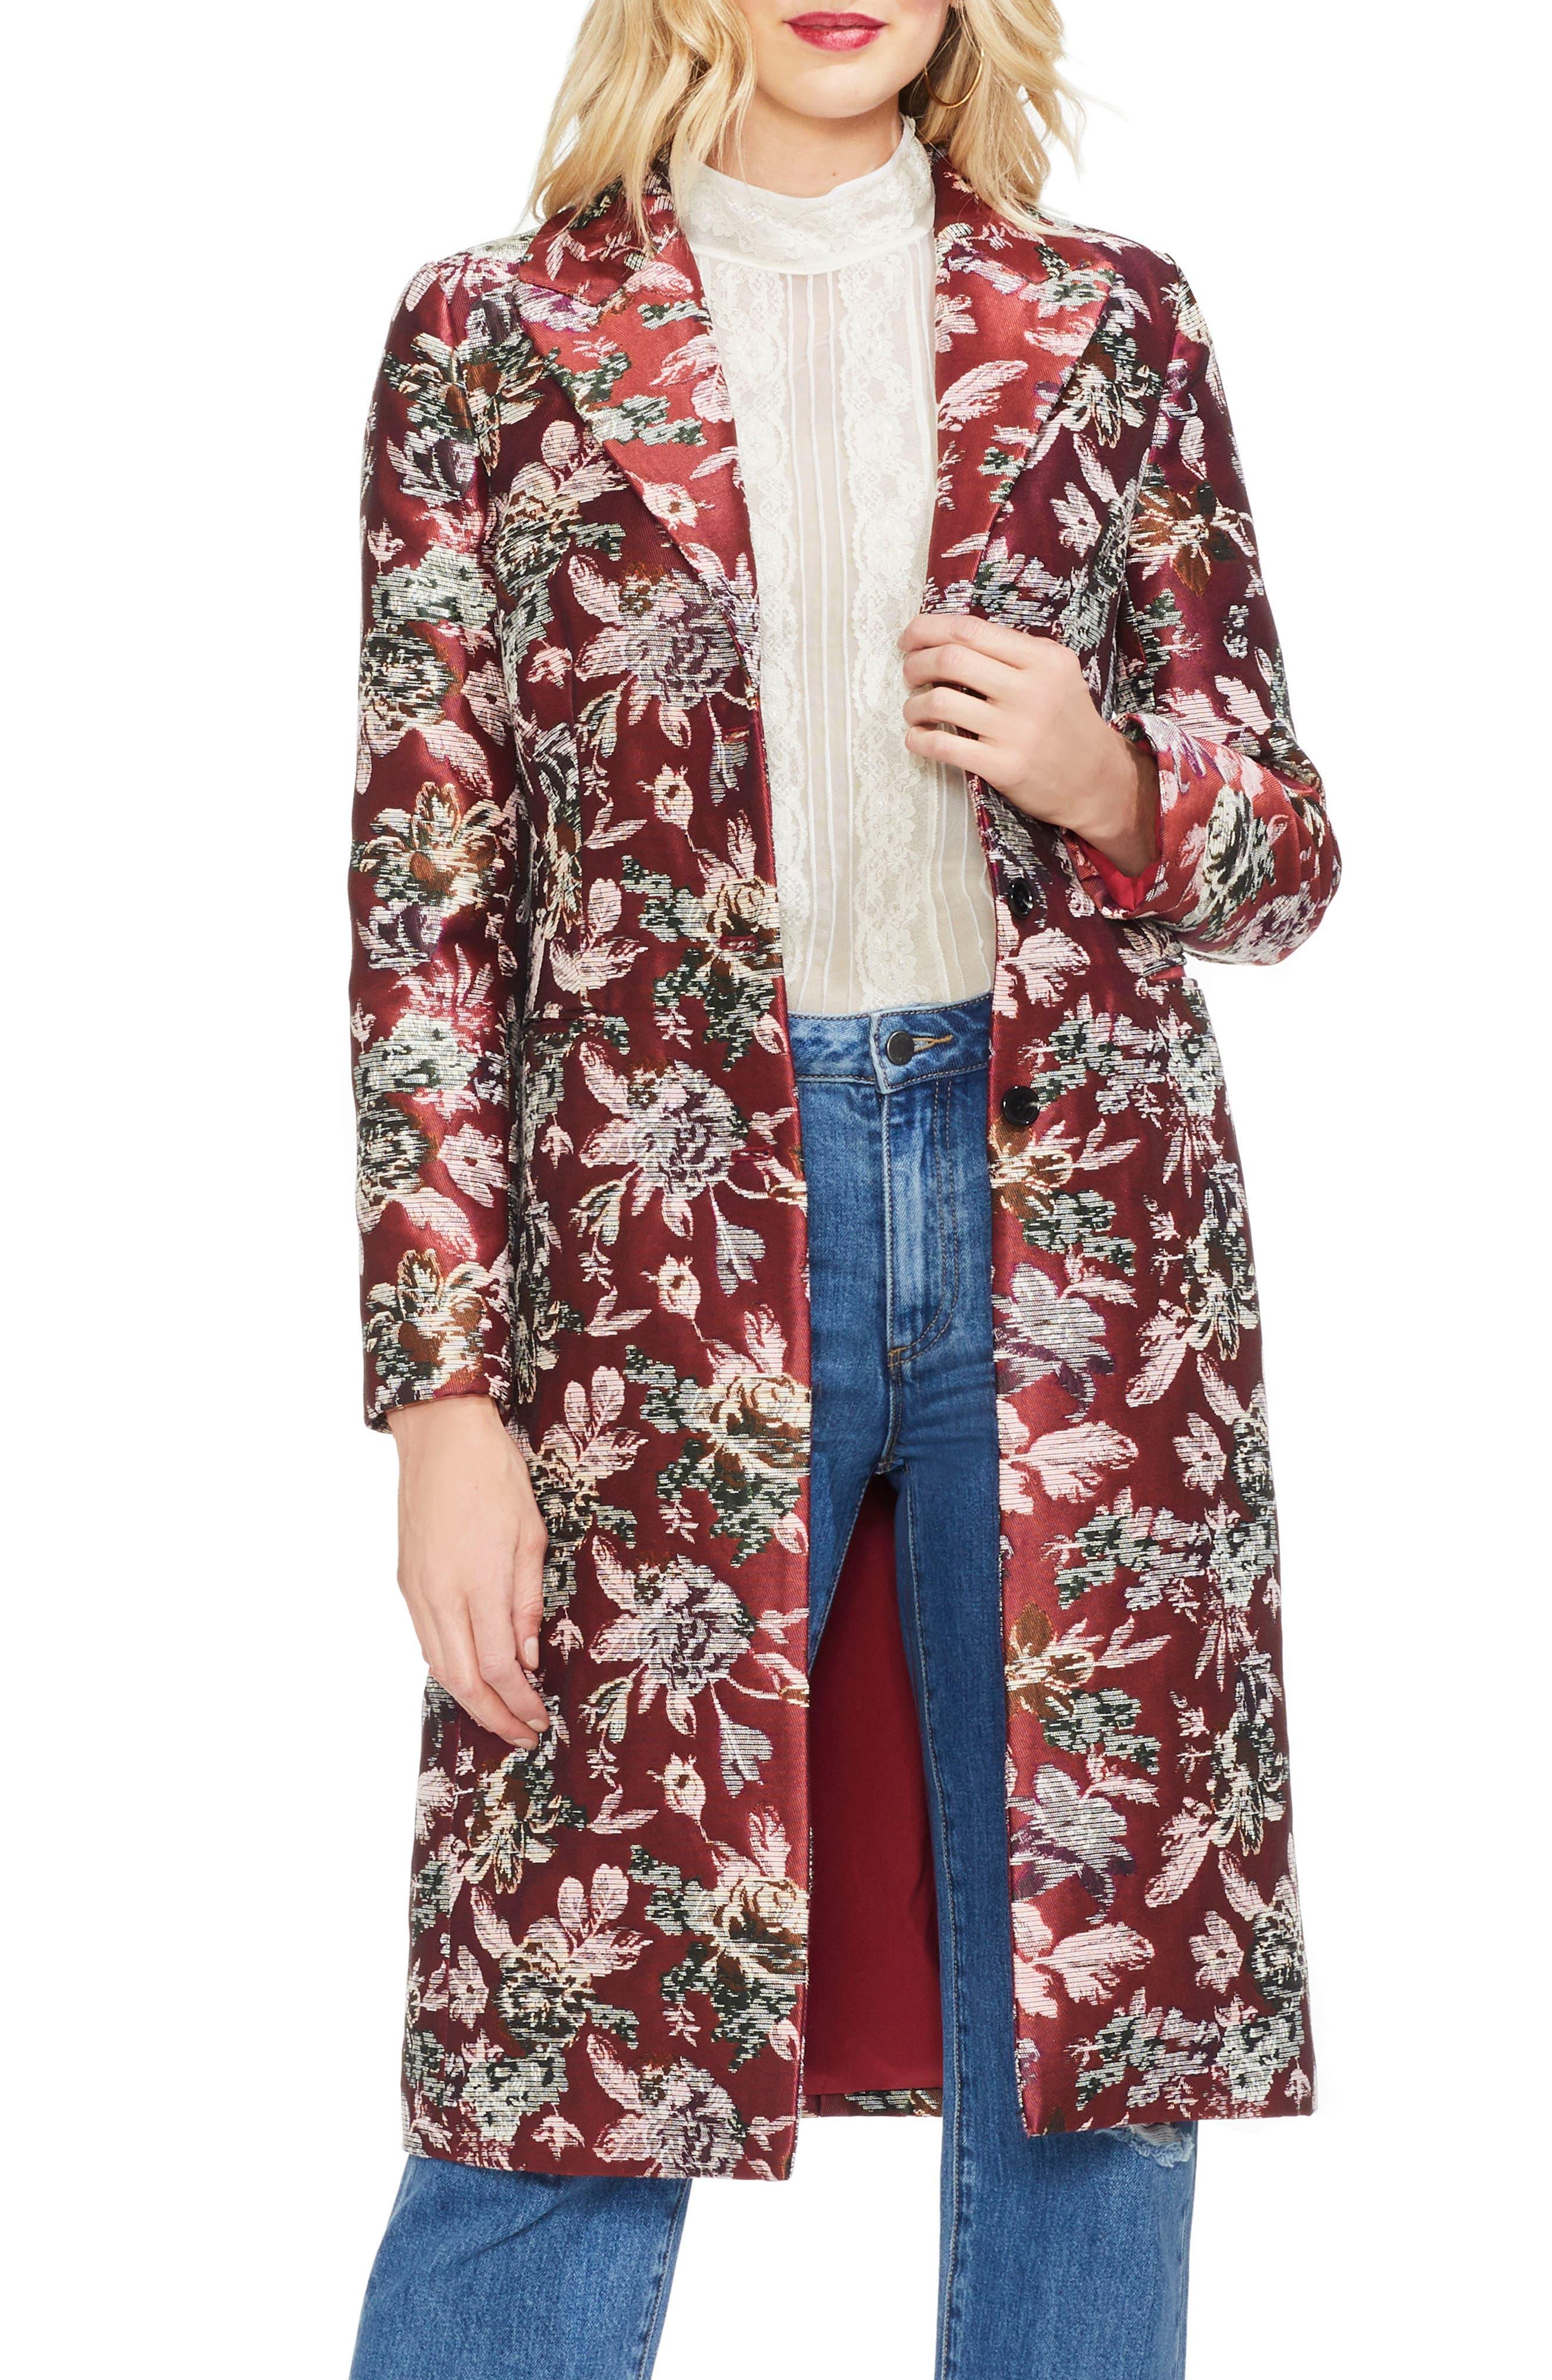 VINCE CAMUTO Floral Tapestry Topper Jacket in Claret